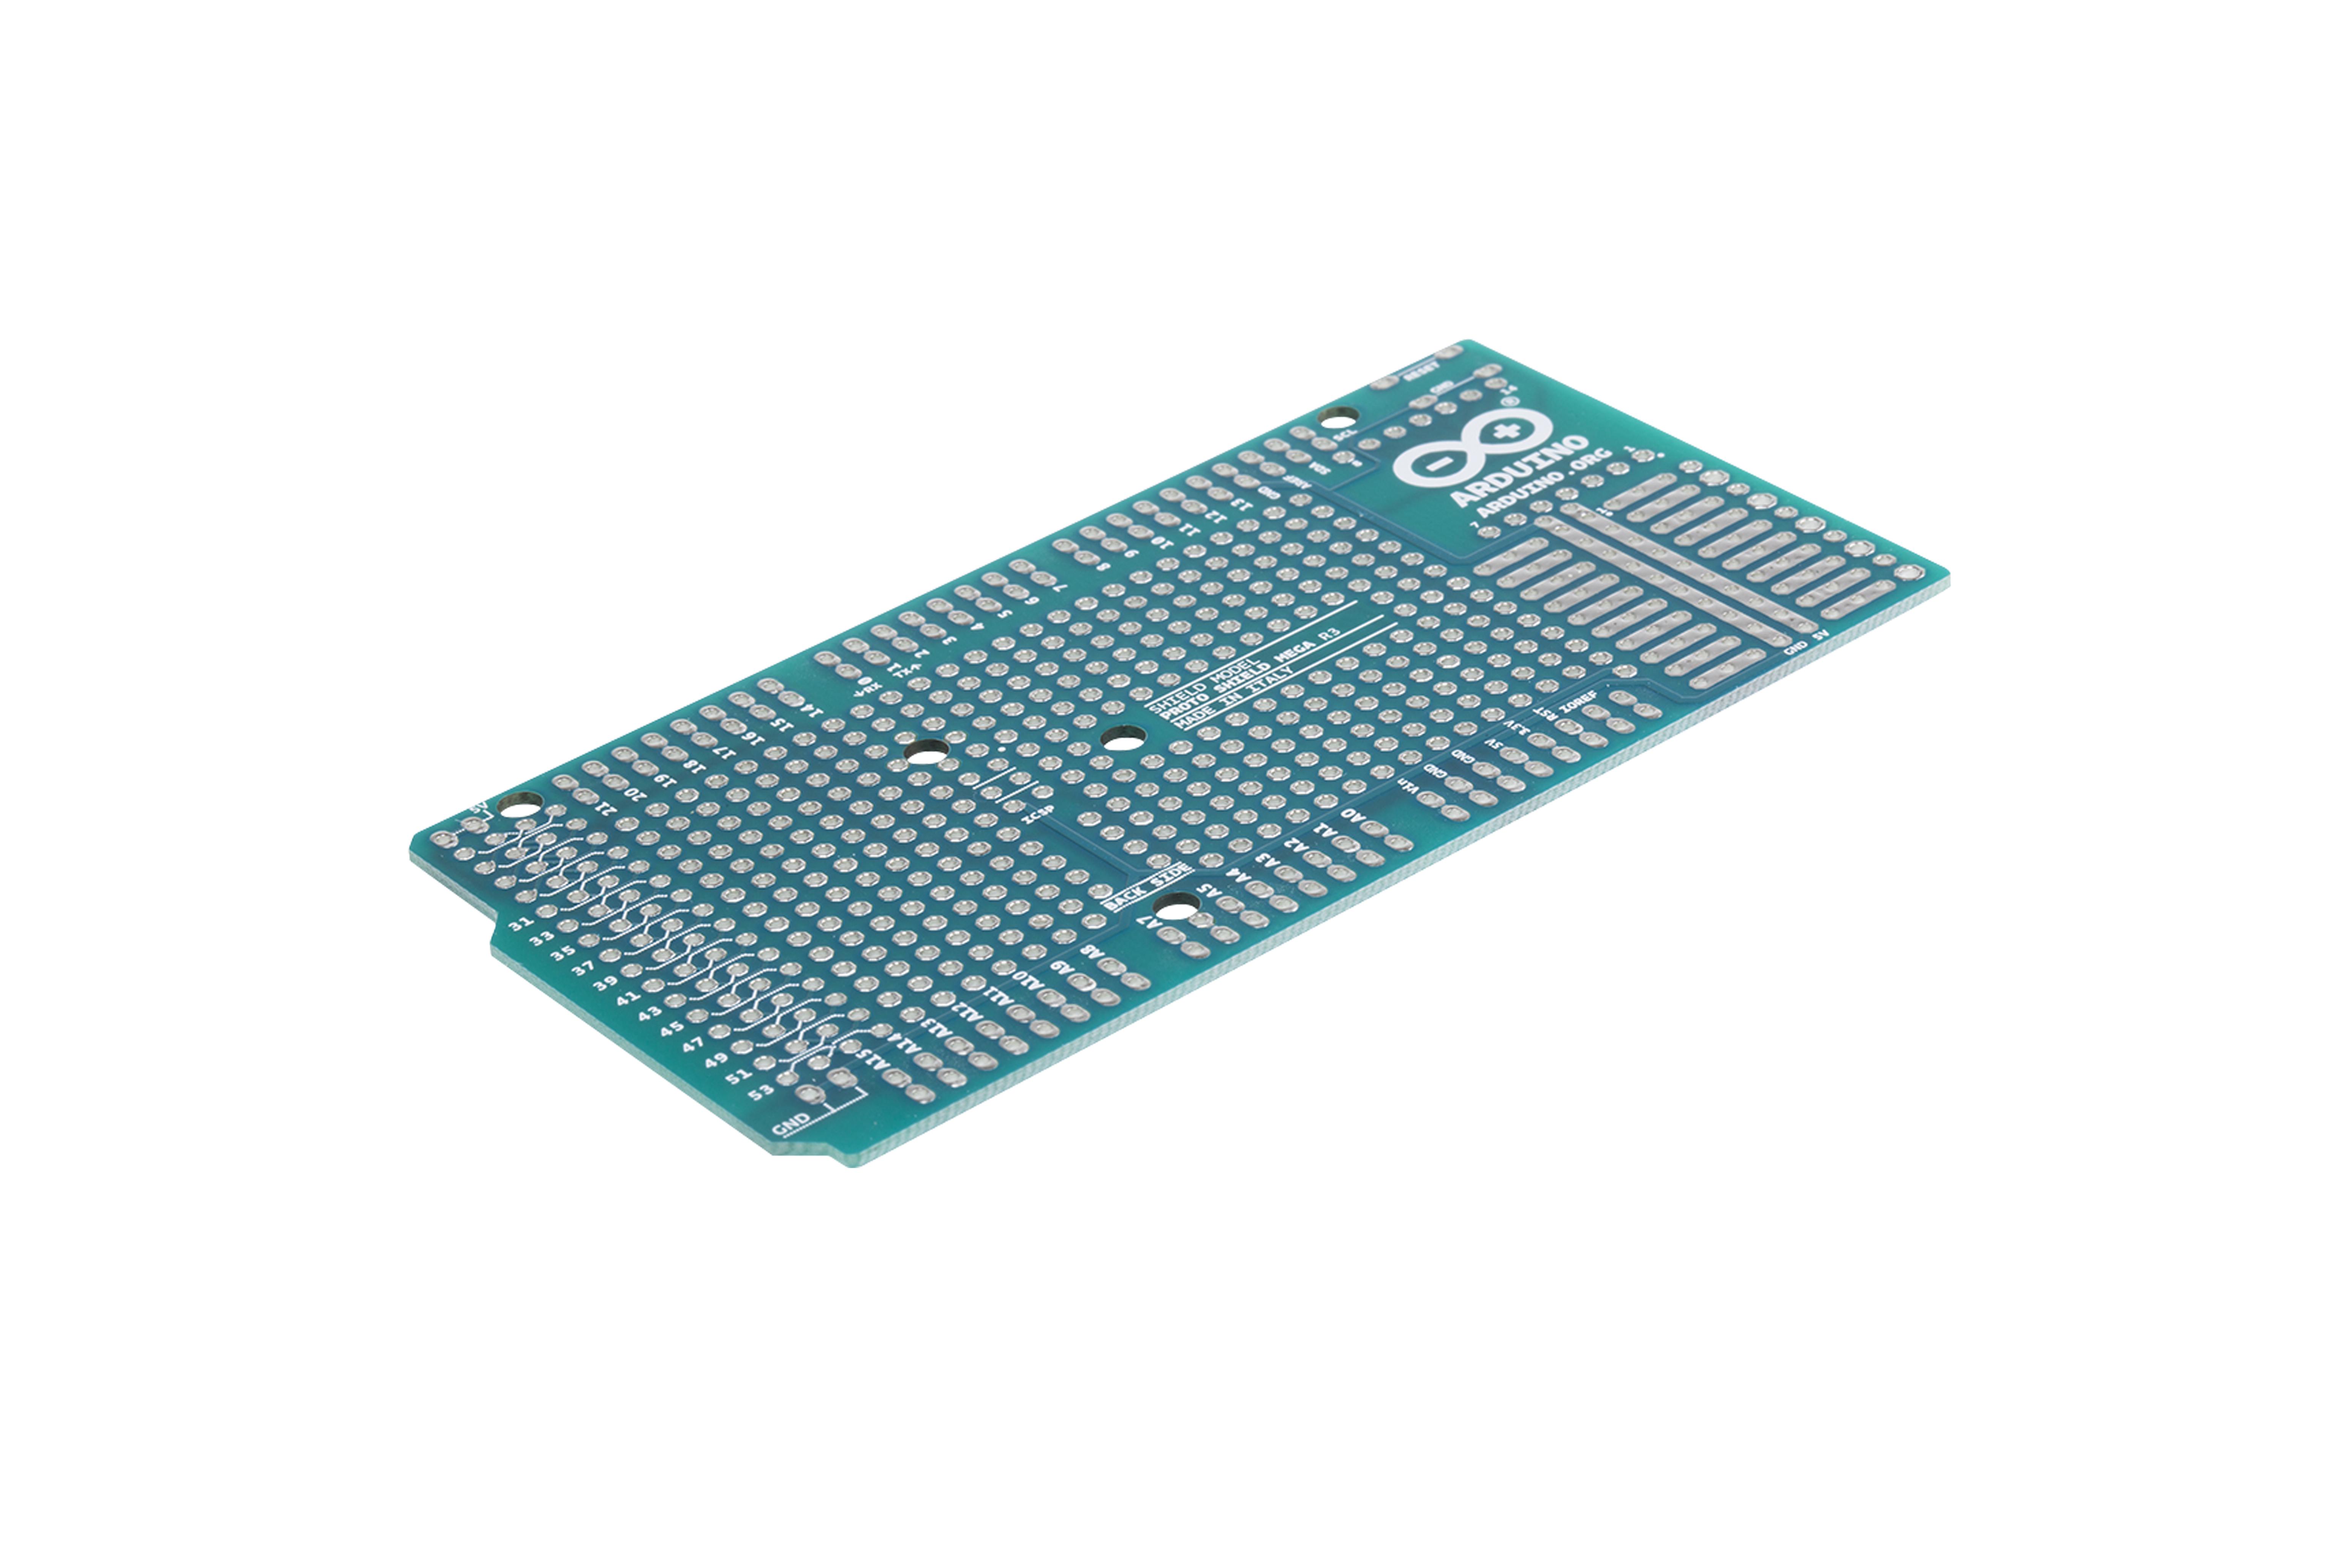 Extension Proto shield Arduino MEGA Rev3